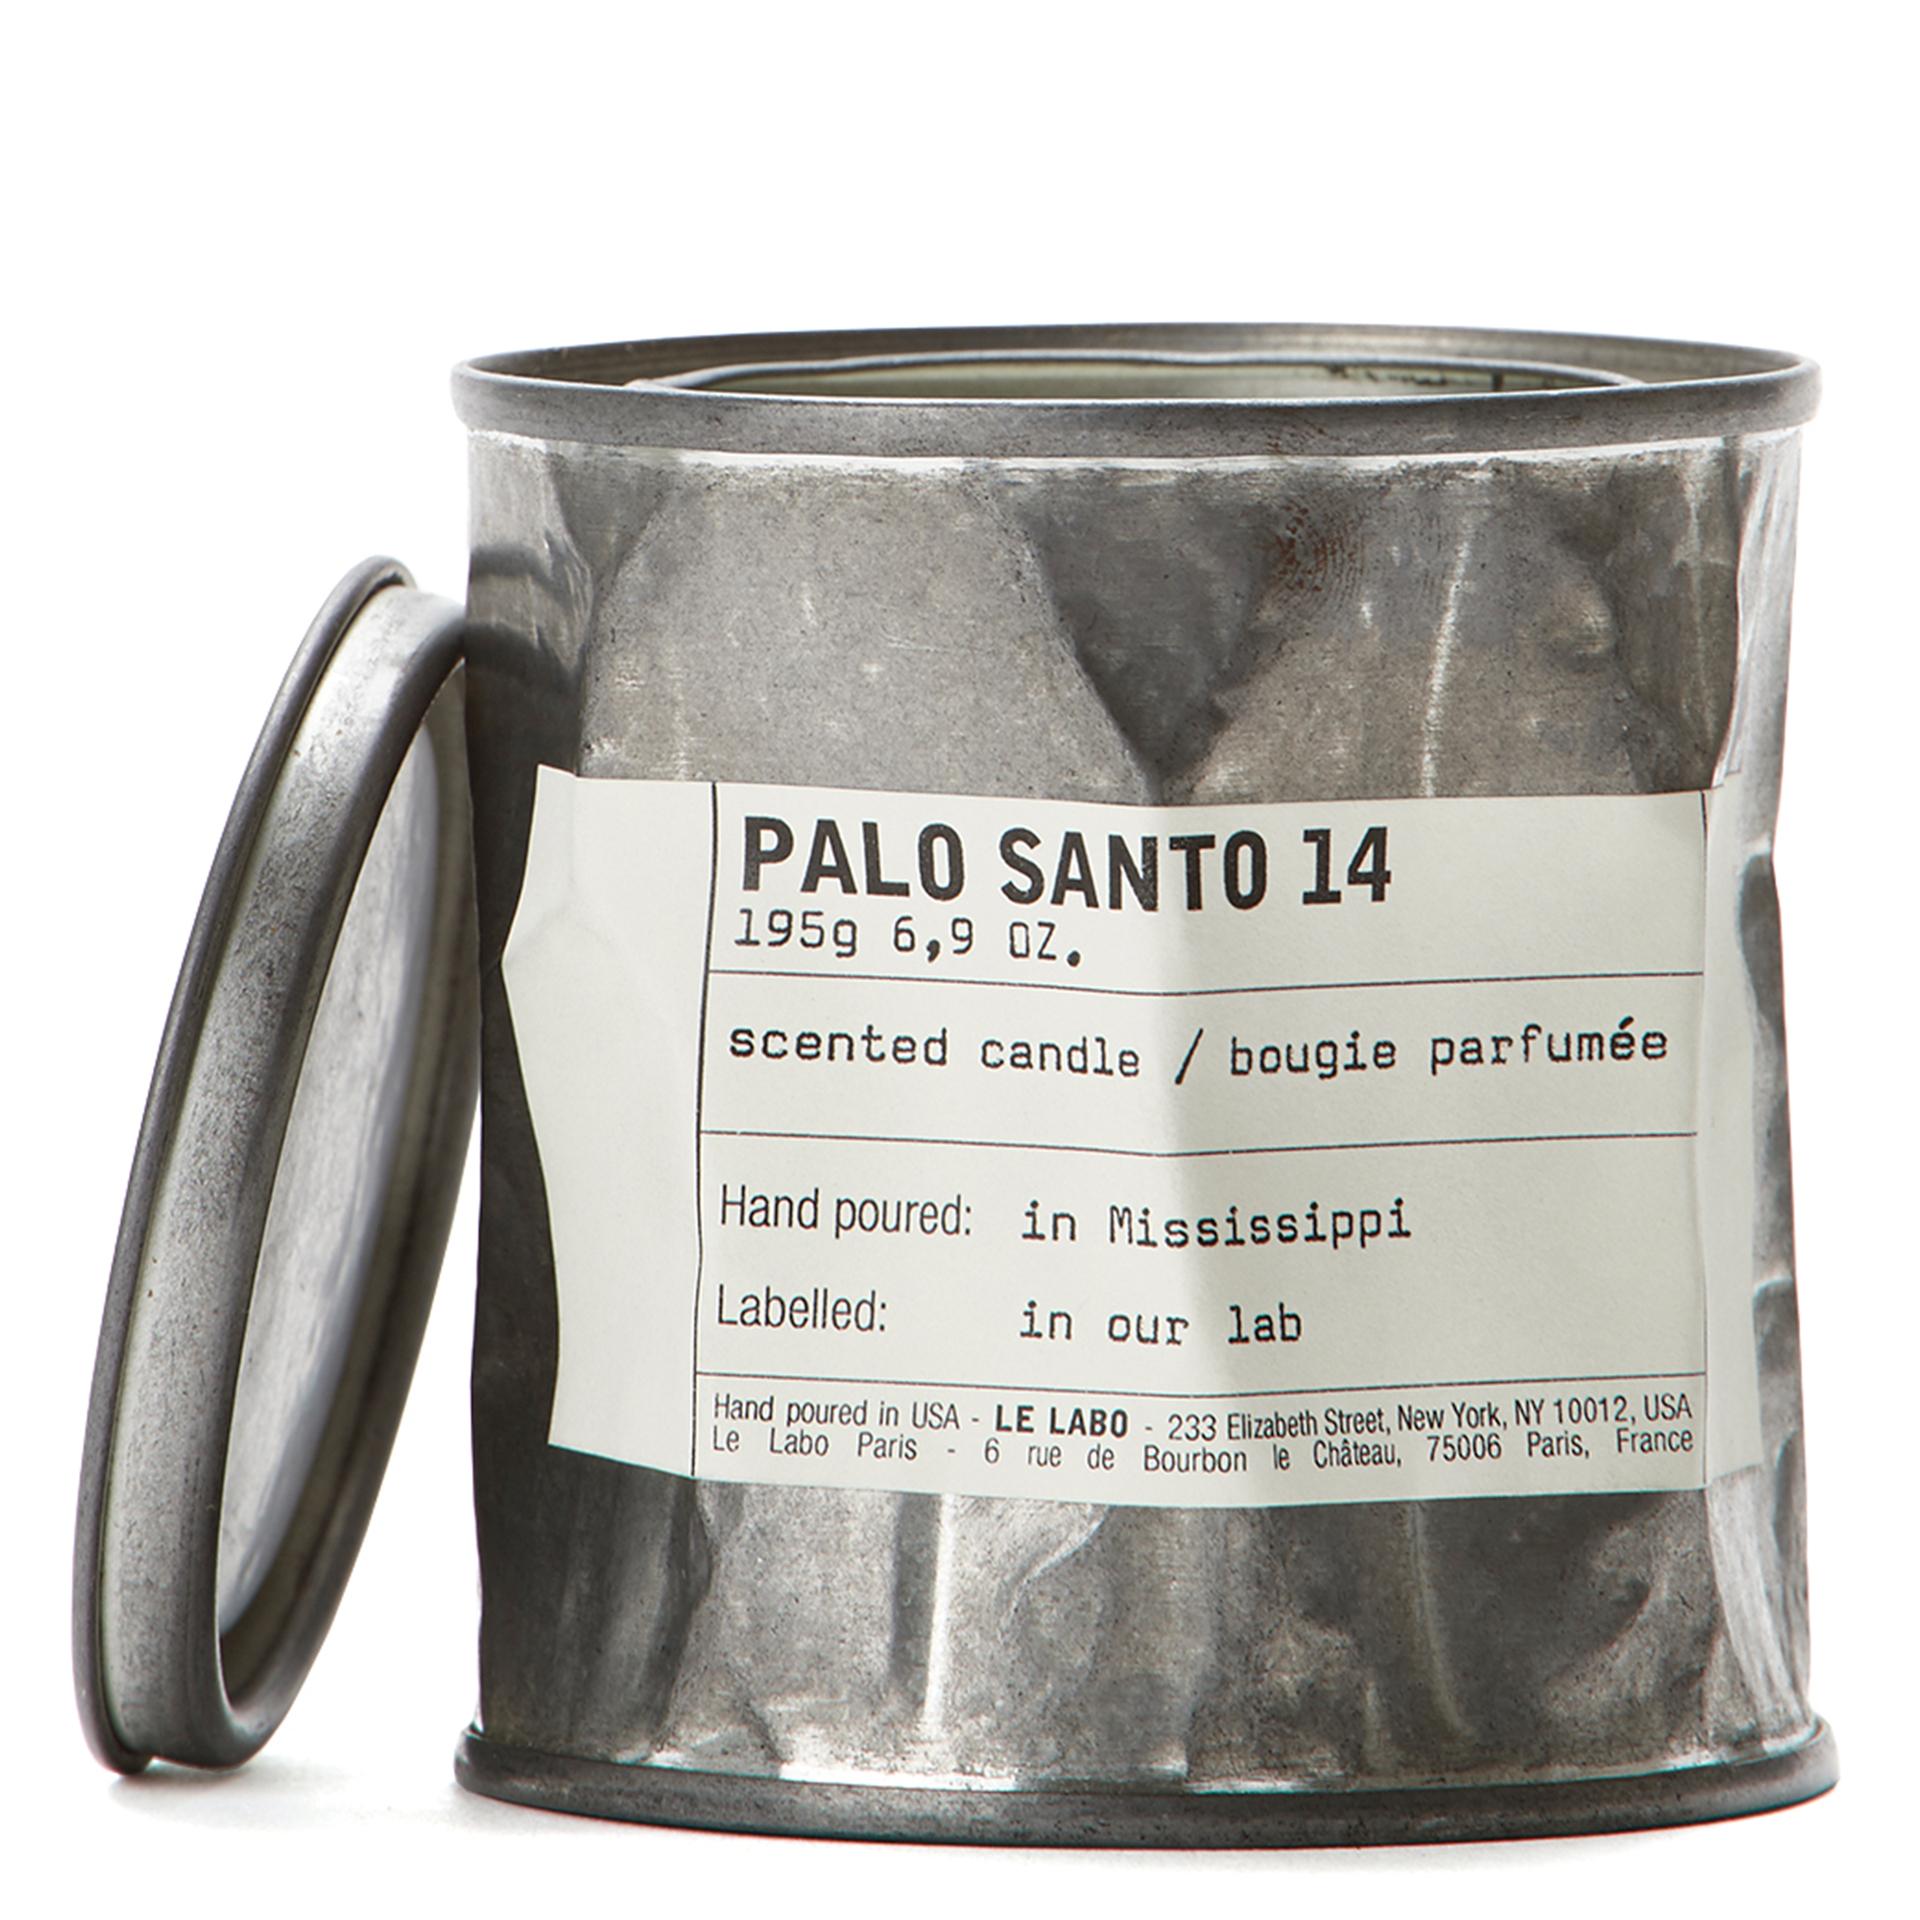 Palo santo 14 - Vintage Candle